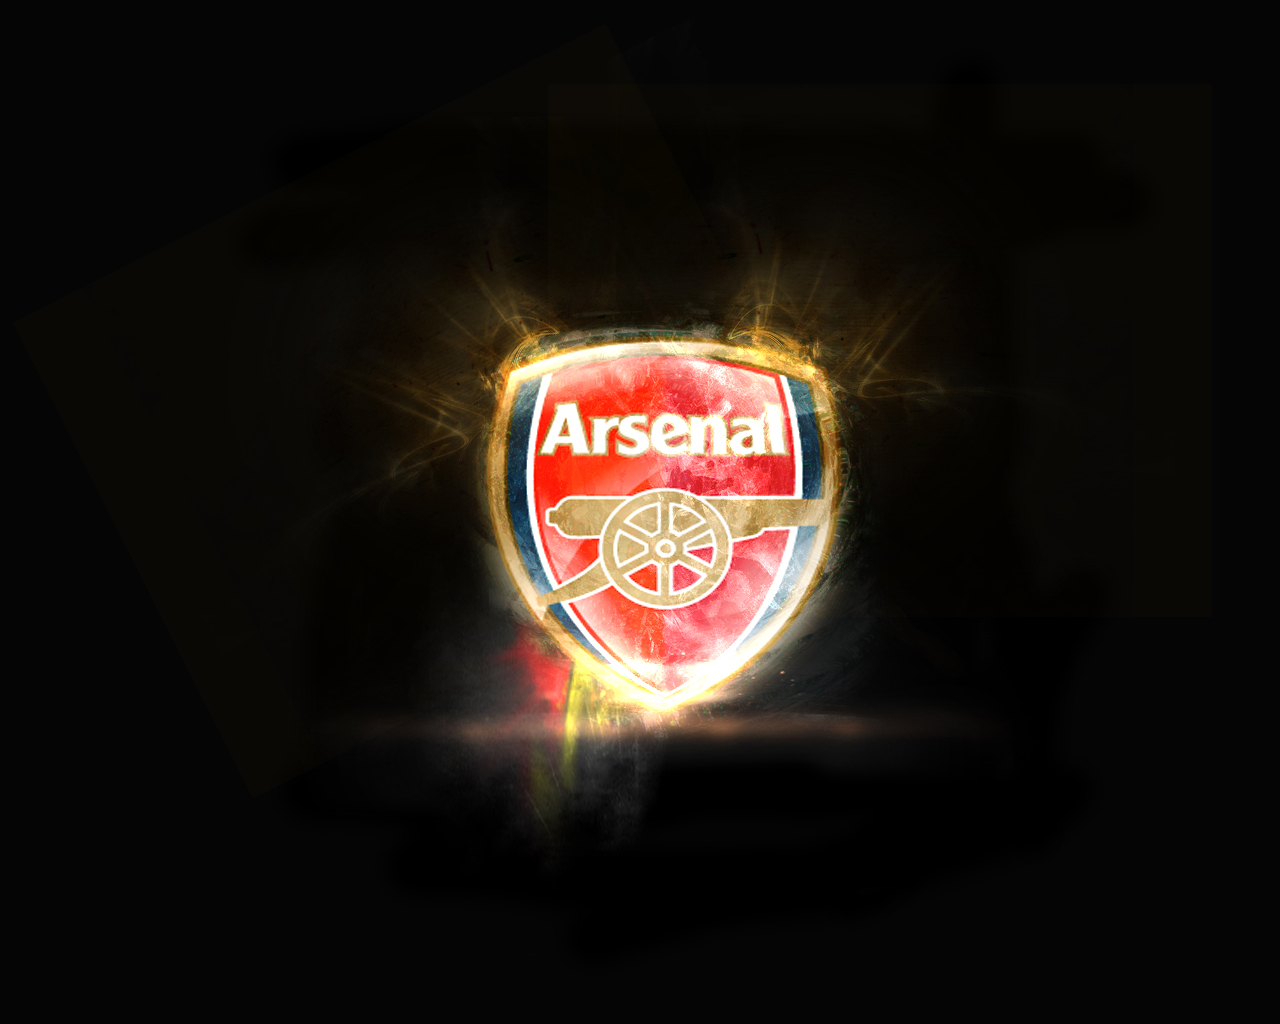 http://4.bp.blogspot.com/-yRY5aWO17Ww/Tcpjzt6kd3I/AAAAAAAAAAY/ekHESR2hJns/s1600/Arsenal_wallpaper_Dynamic.jpg